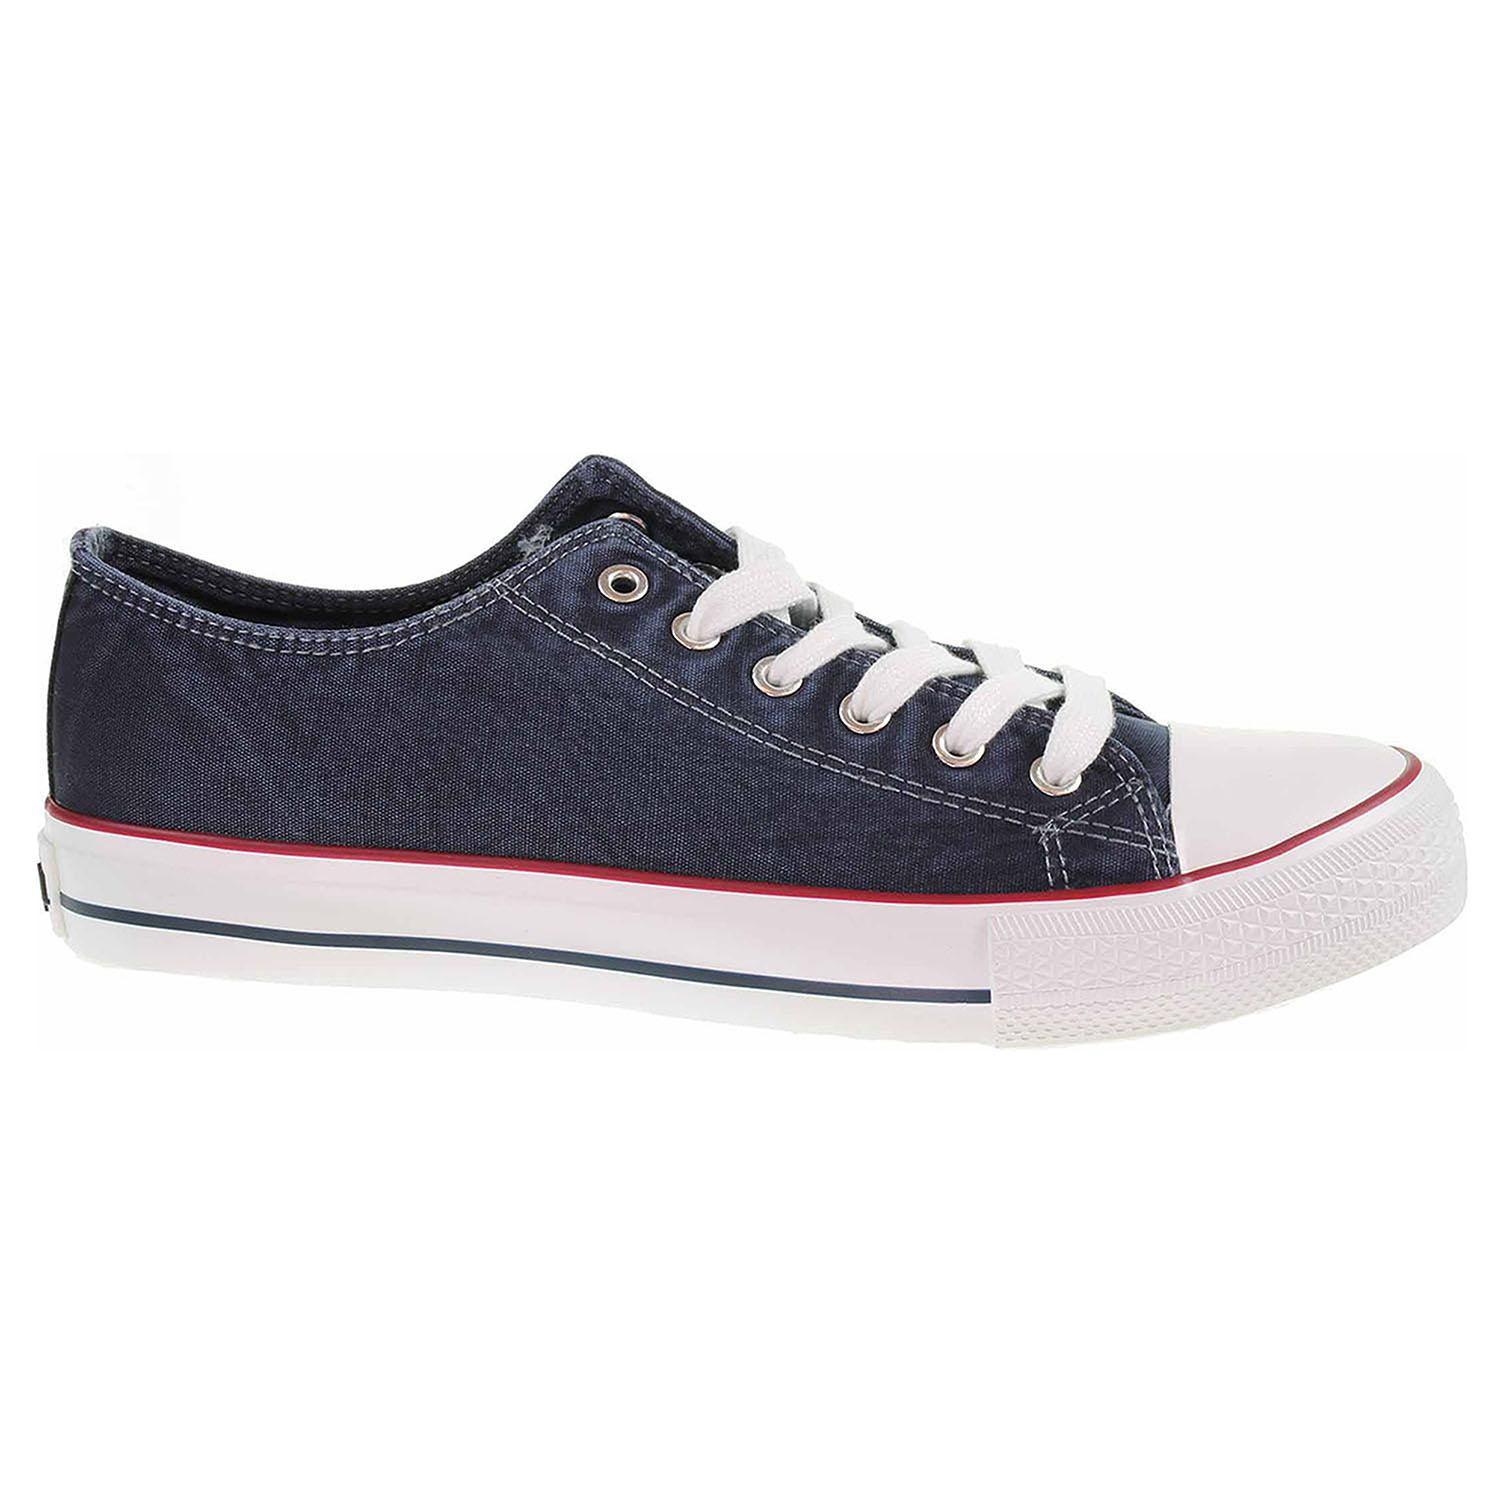 Ecco Pánská obuv Lee Cooper LCW-20-31-033 navy 24000573